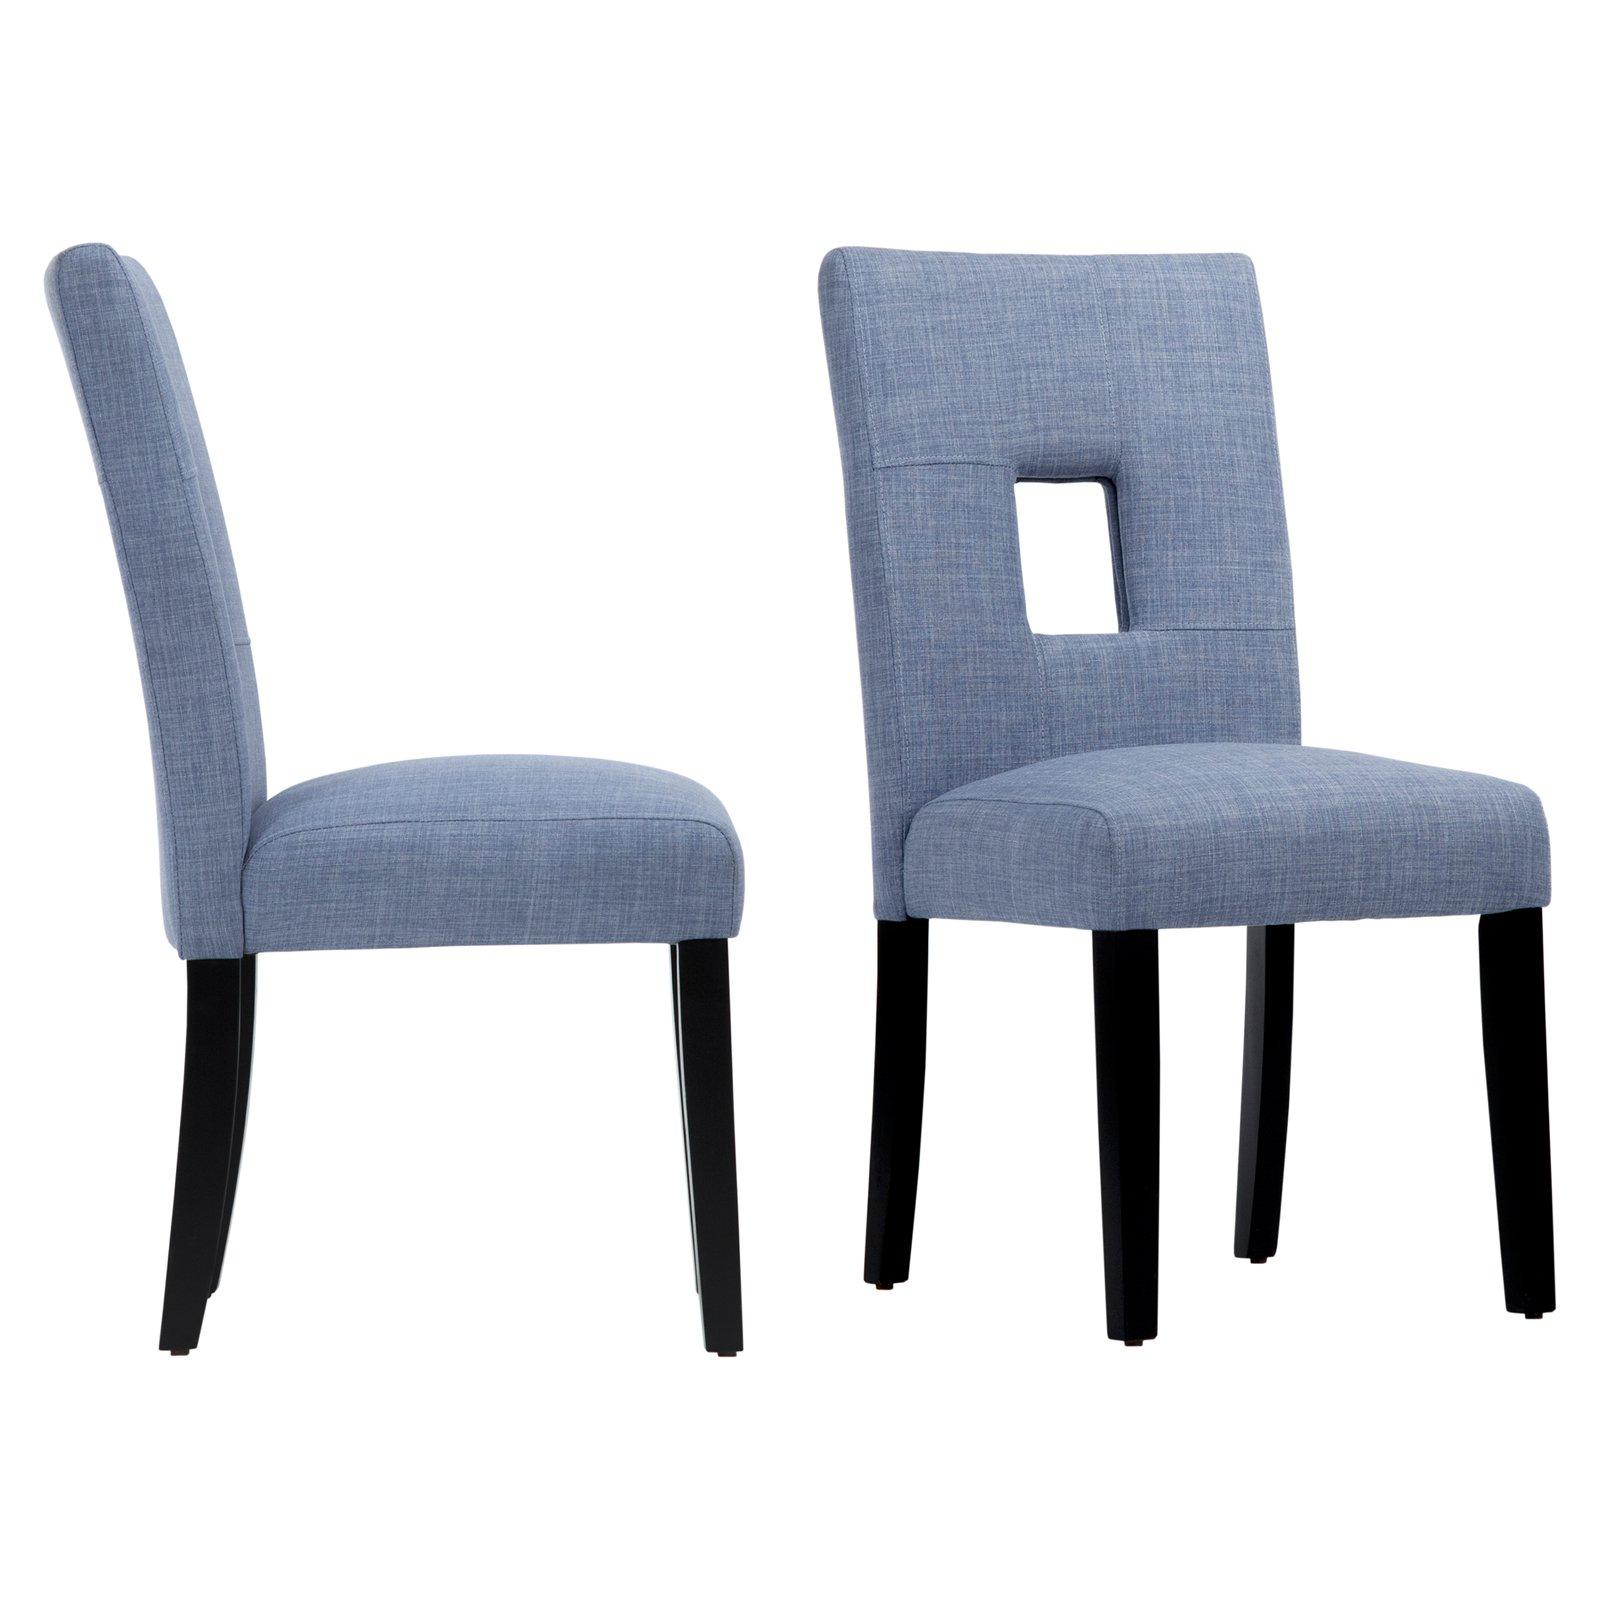 Chelsea Lane Keyhole Side Chair, Set of (2)